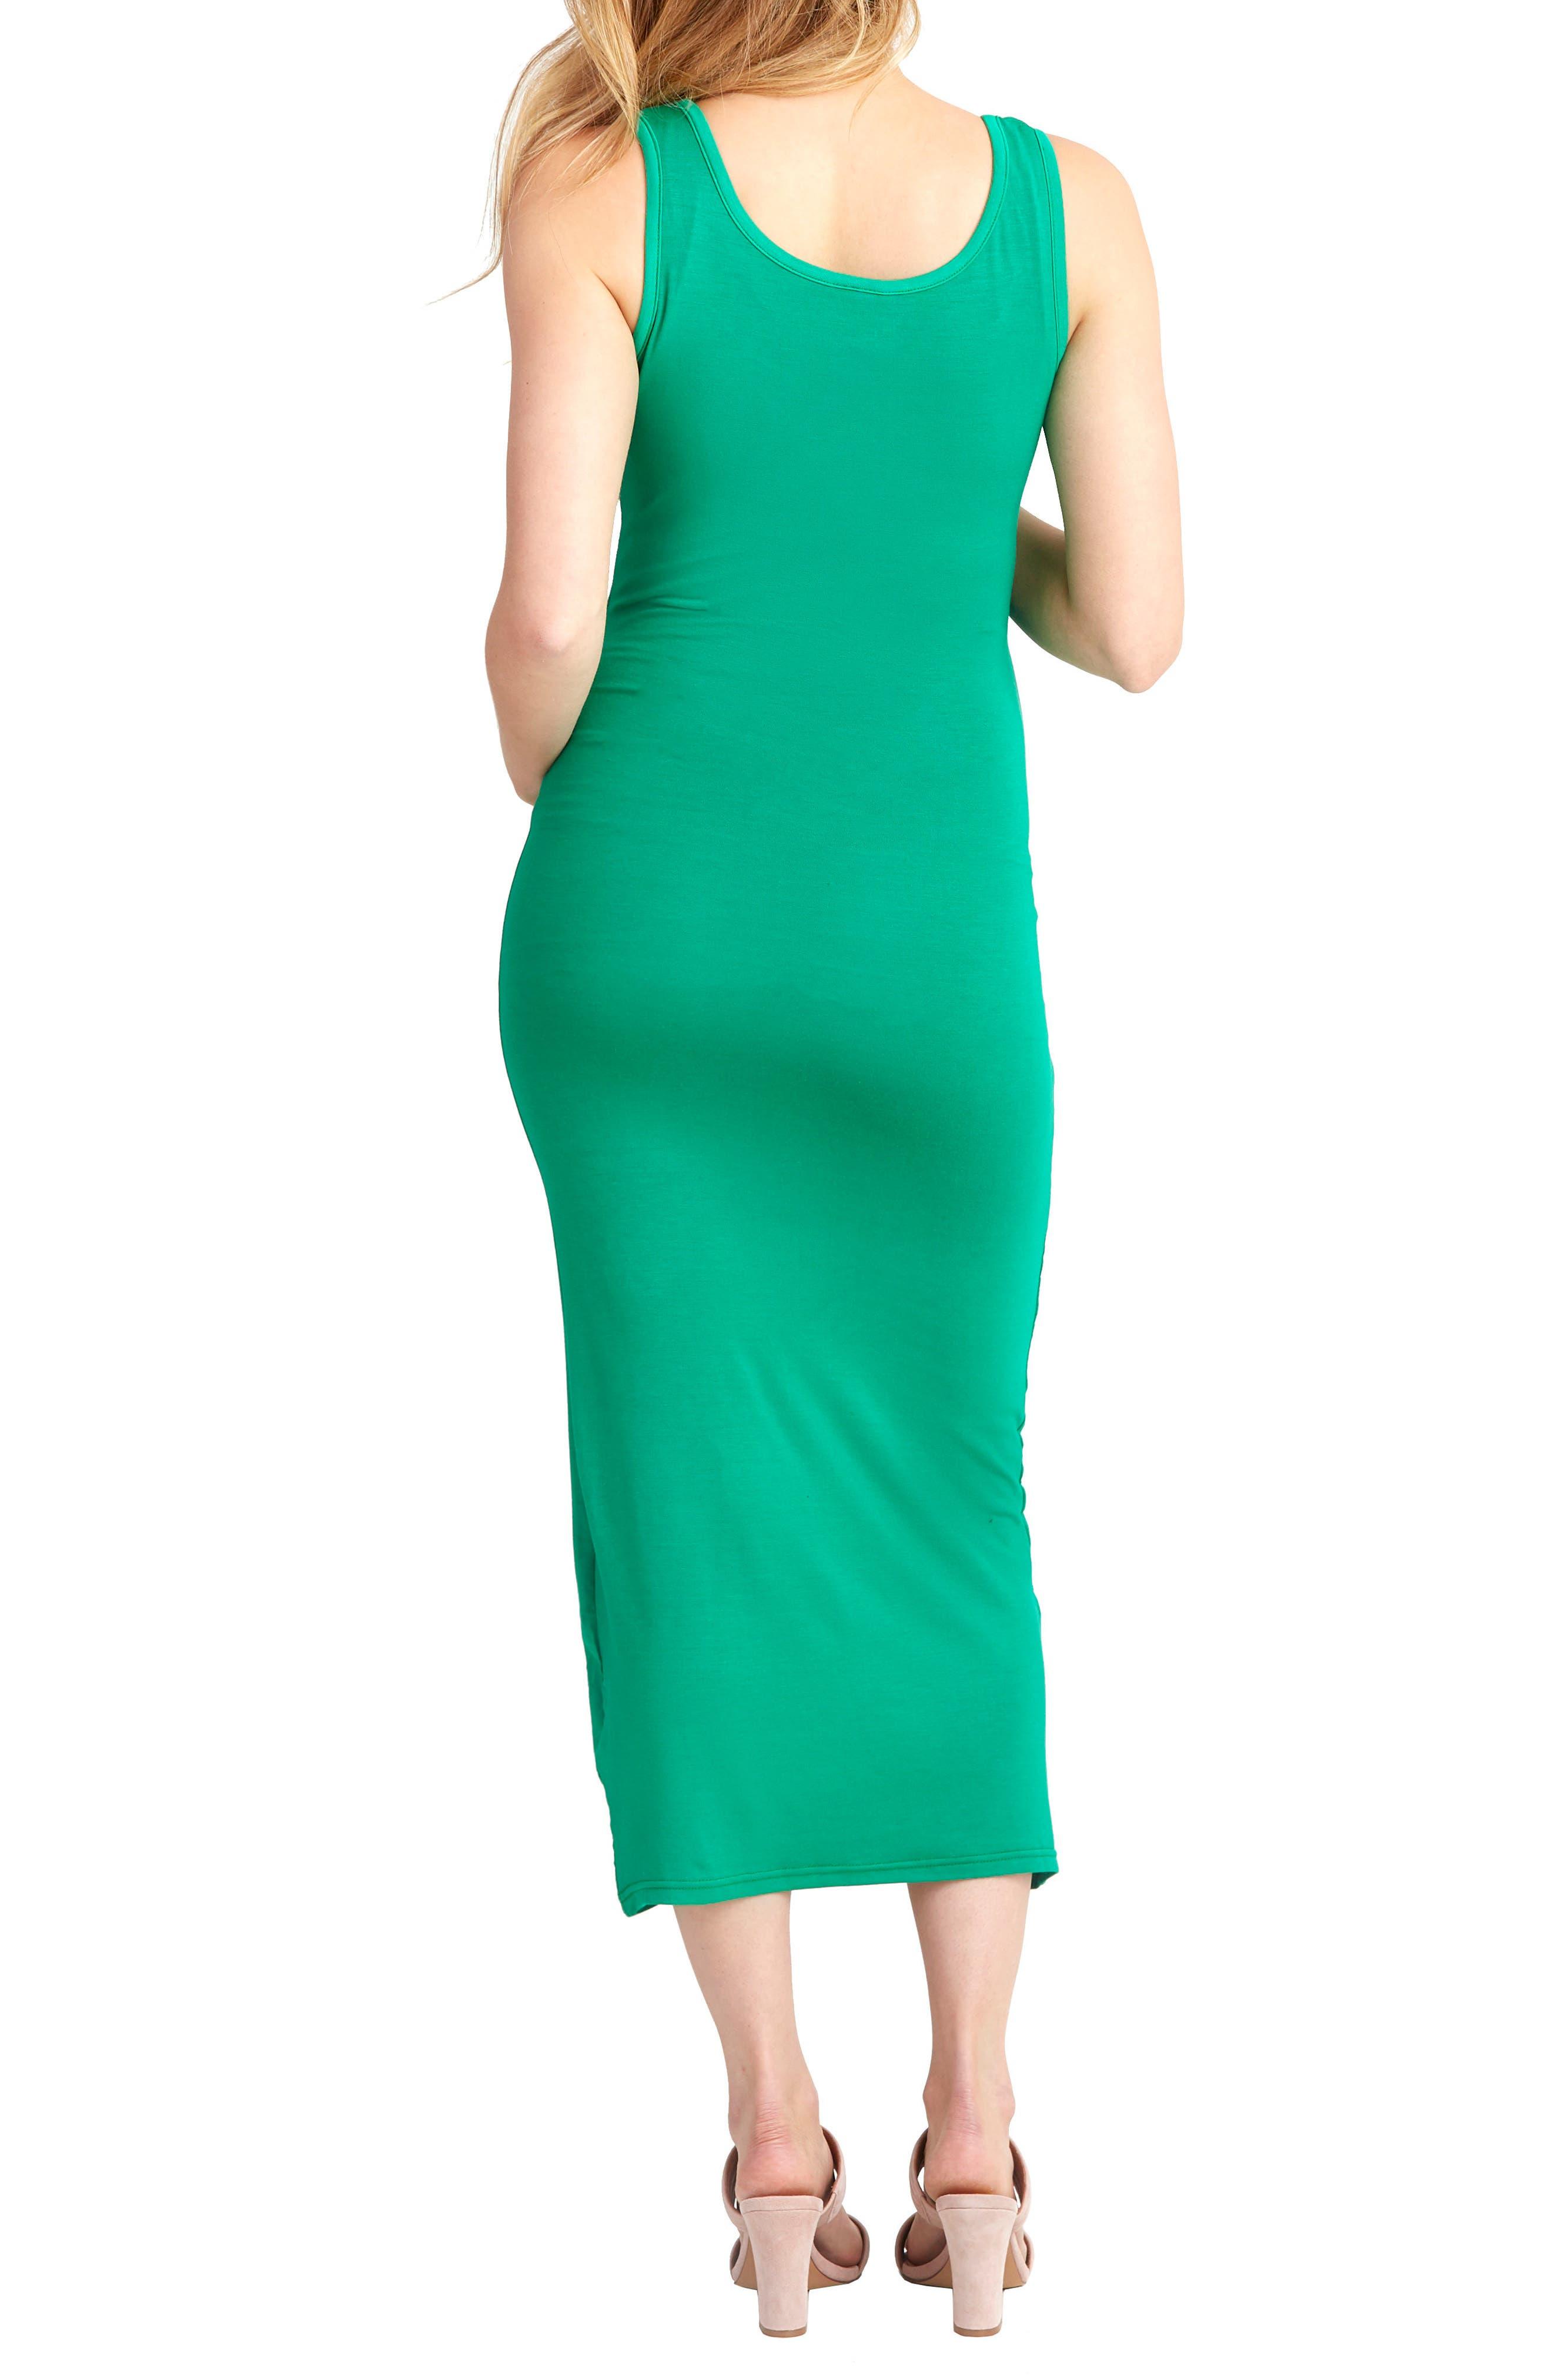 Snap Placket Maternity/Nursing Tank Dress,                             Alternate thumbnail 2, color,                             KELLY GREEN